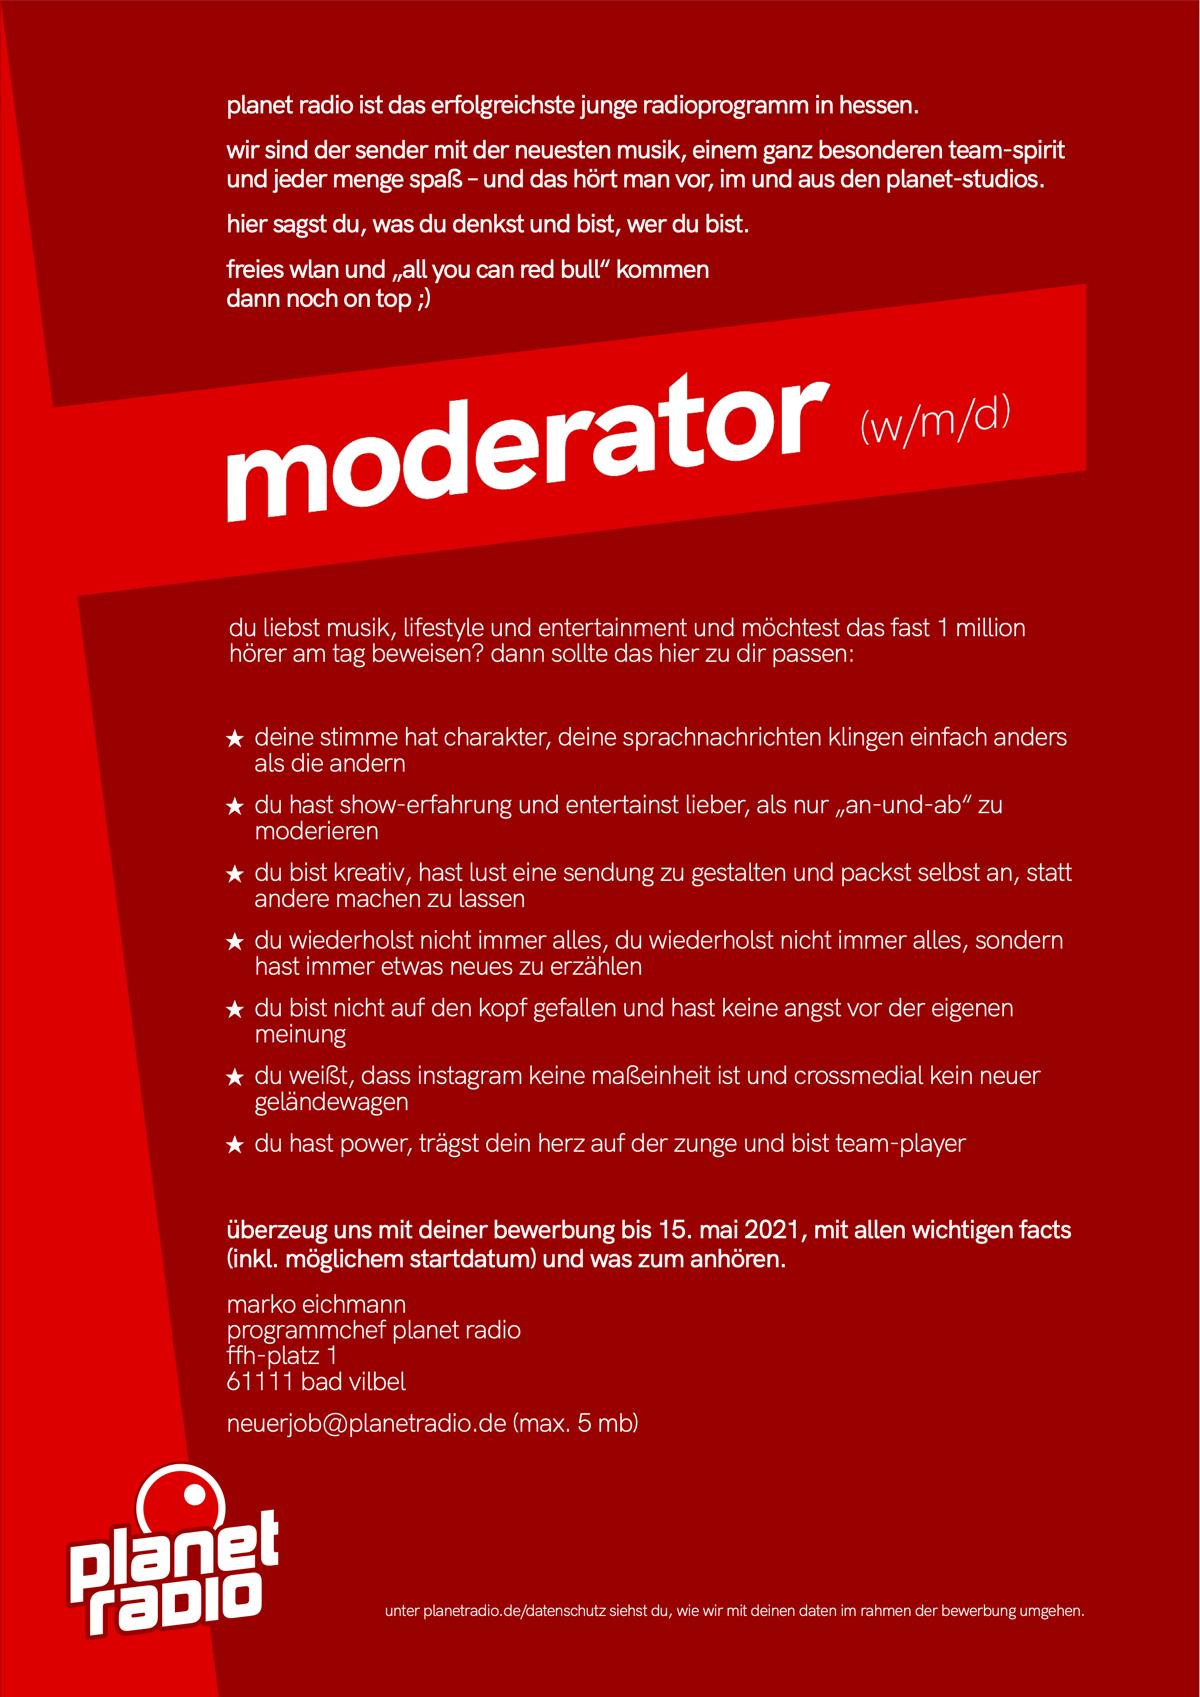 planet radio sucht moderator (w/m/d)